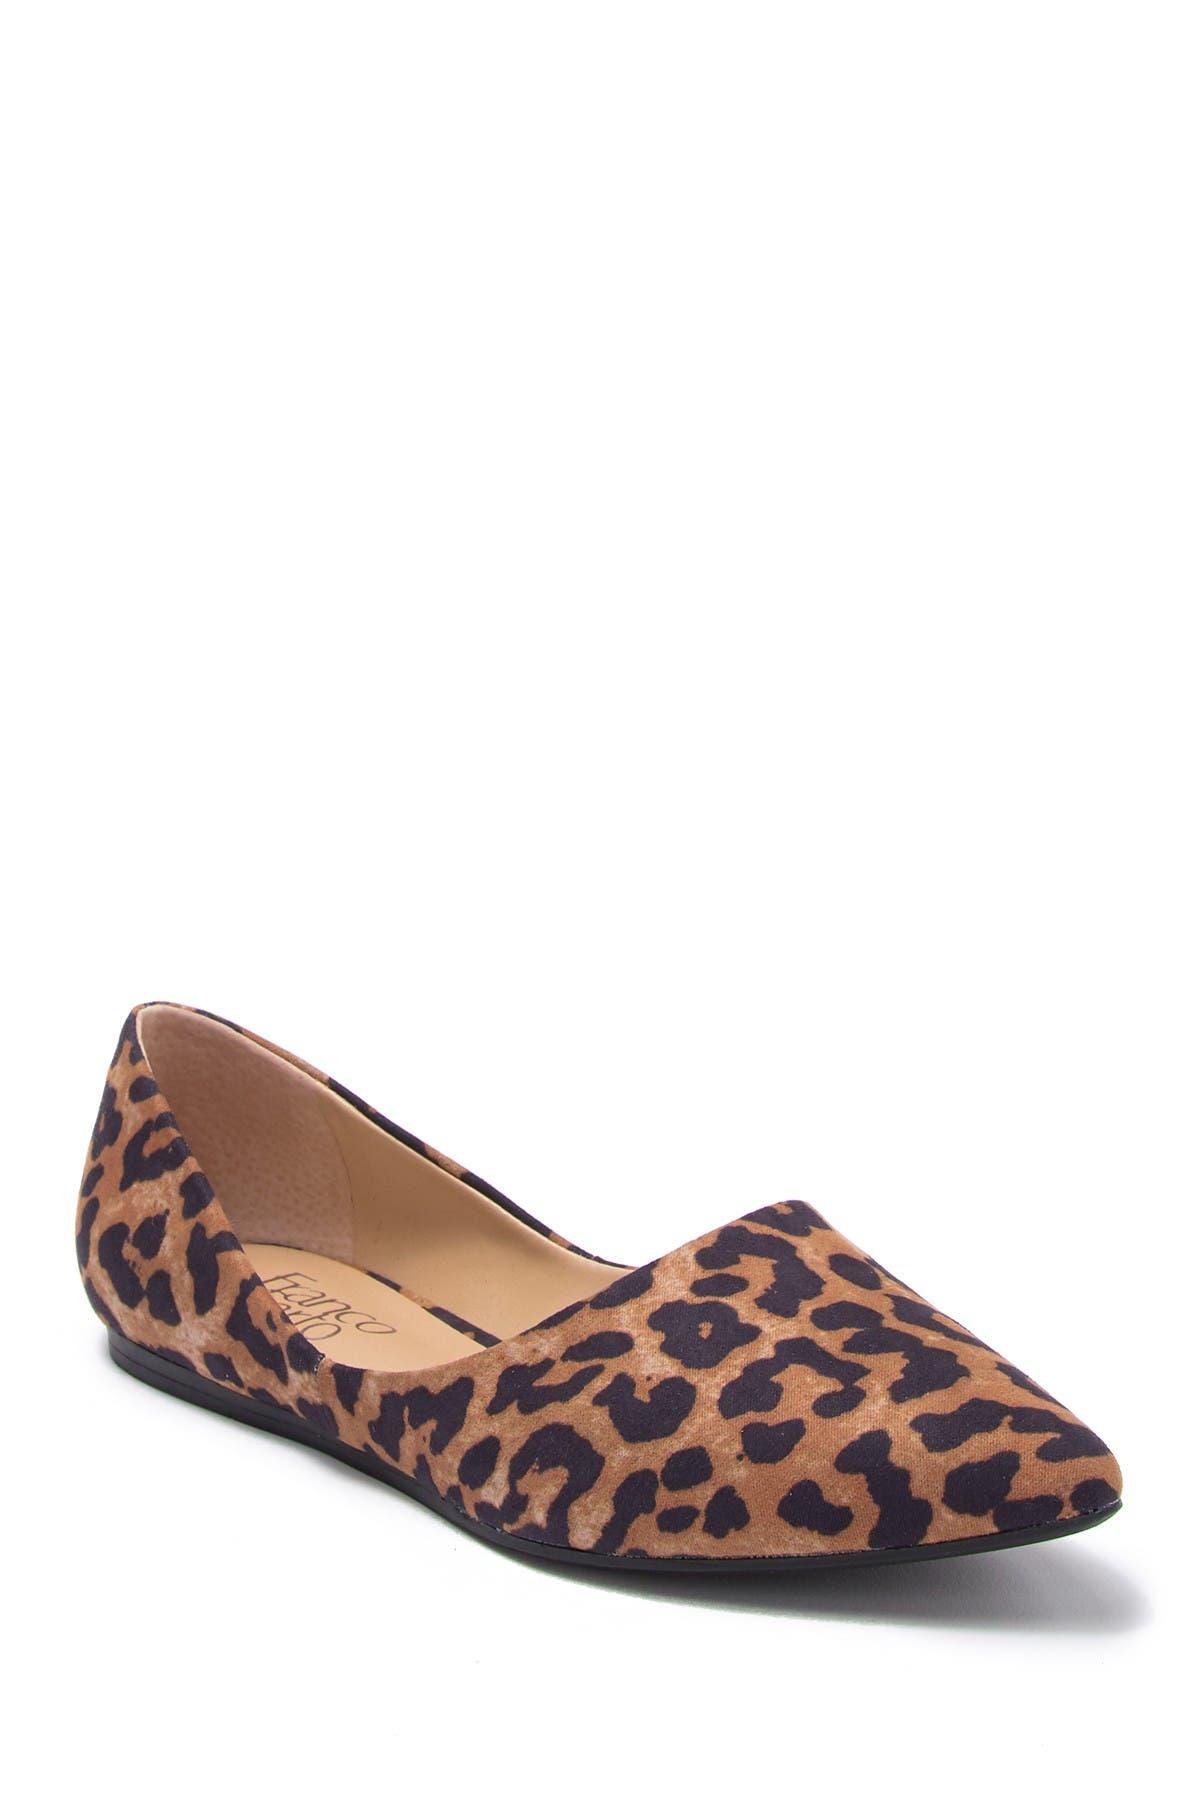 Franco Sarto | Hazeline Leopard Pointed